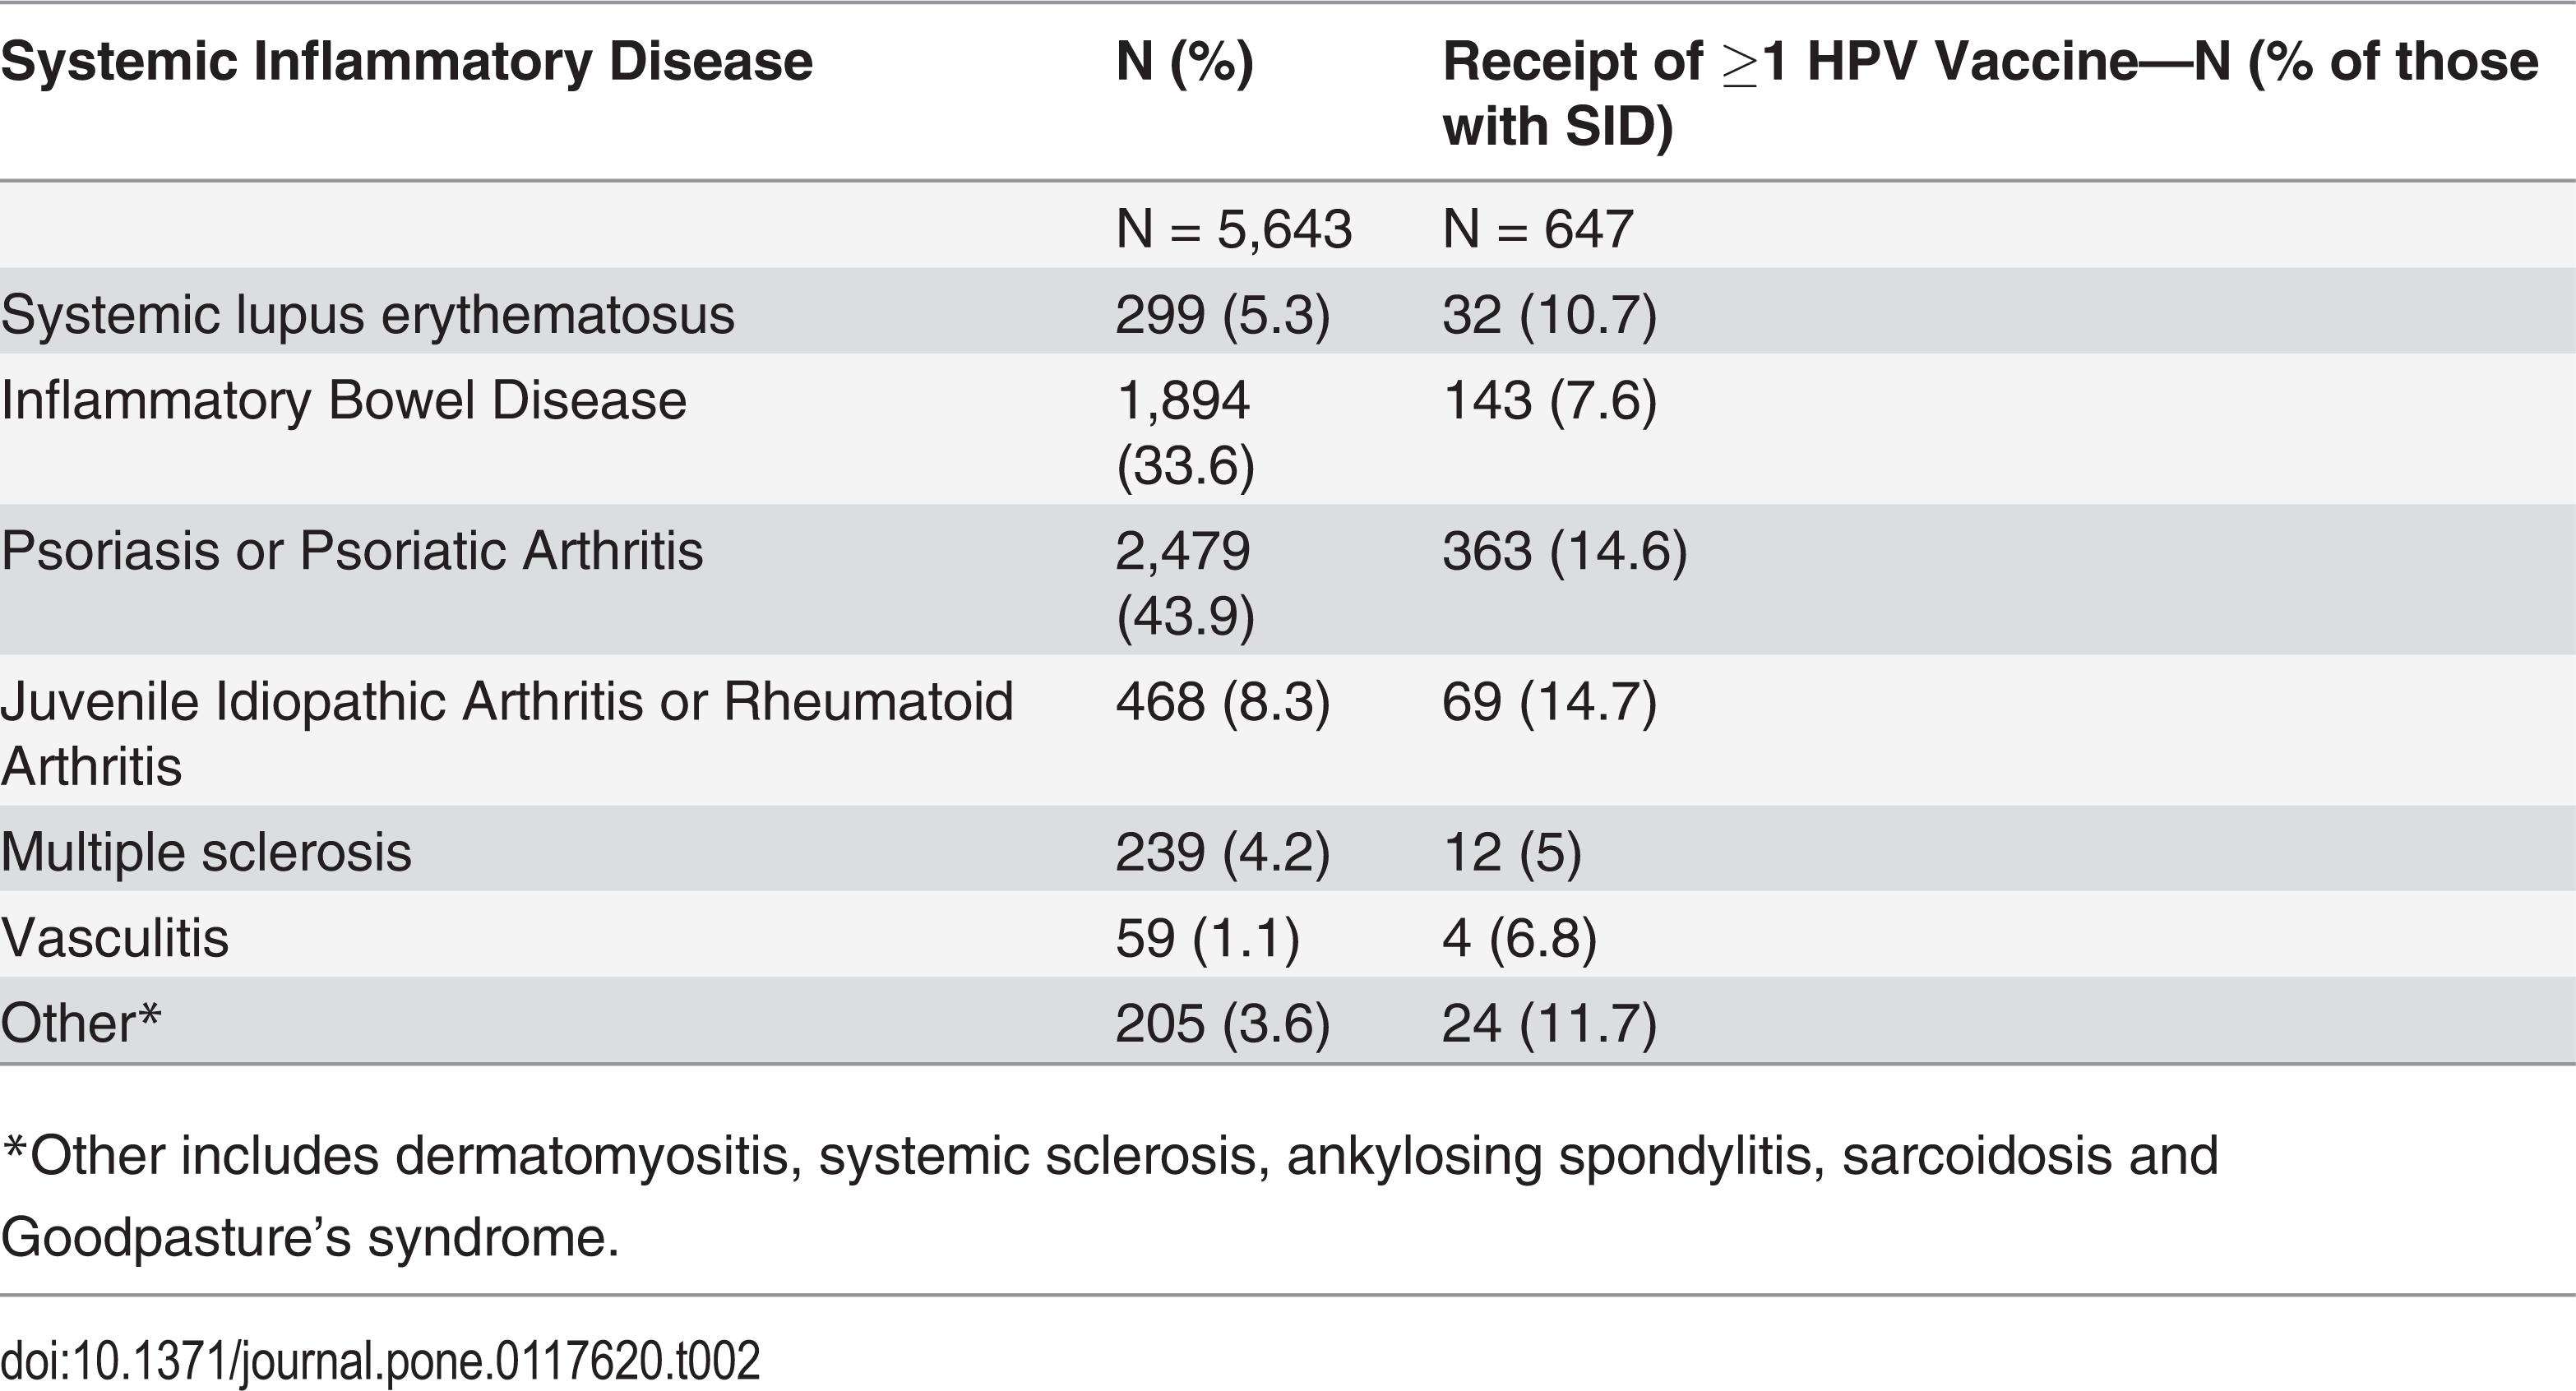 human papillomavirus vaccine and systemic lupus erythematosus squamous papilloma uvula histology